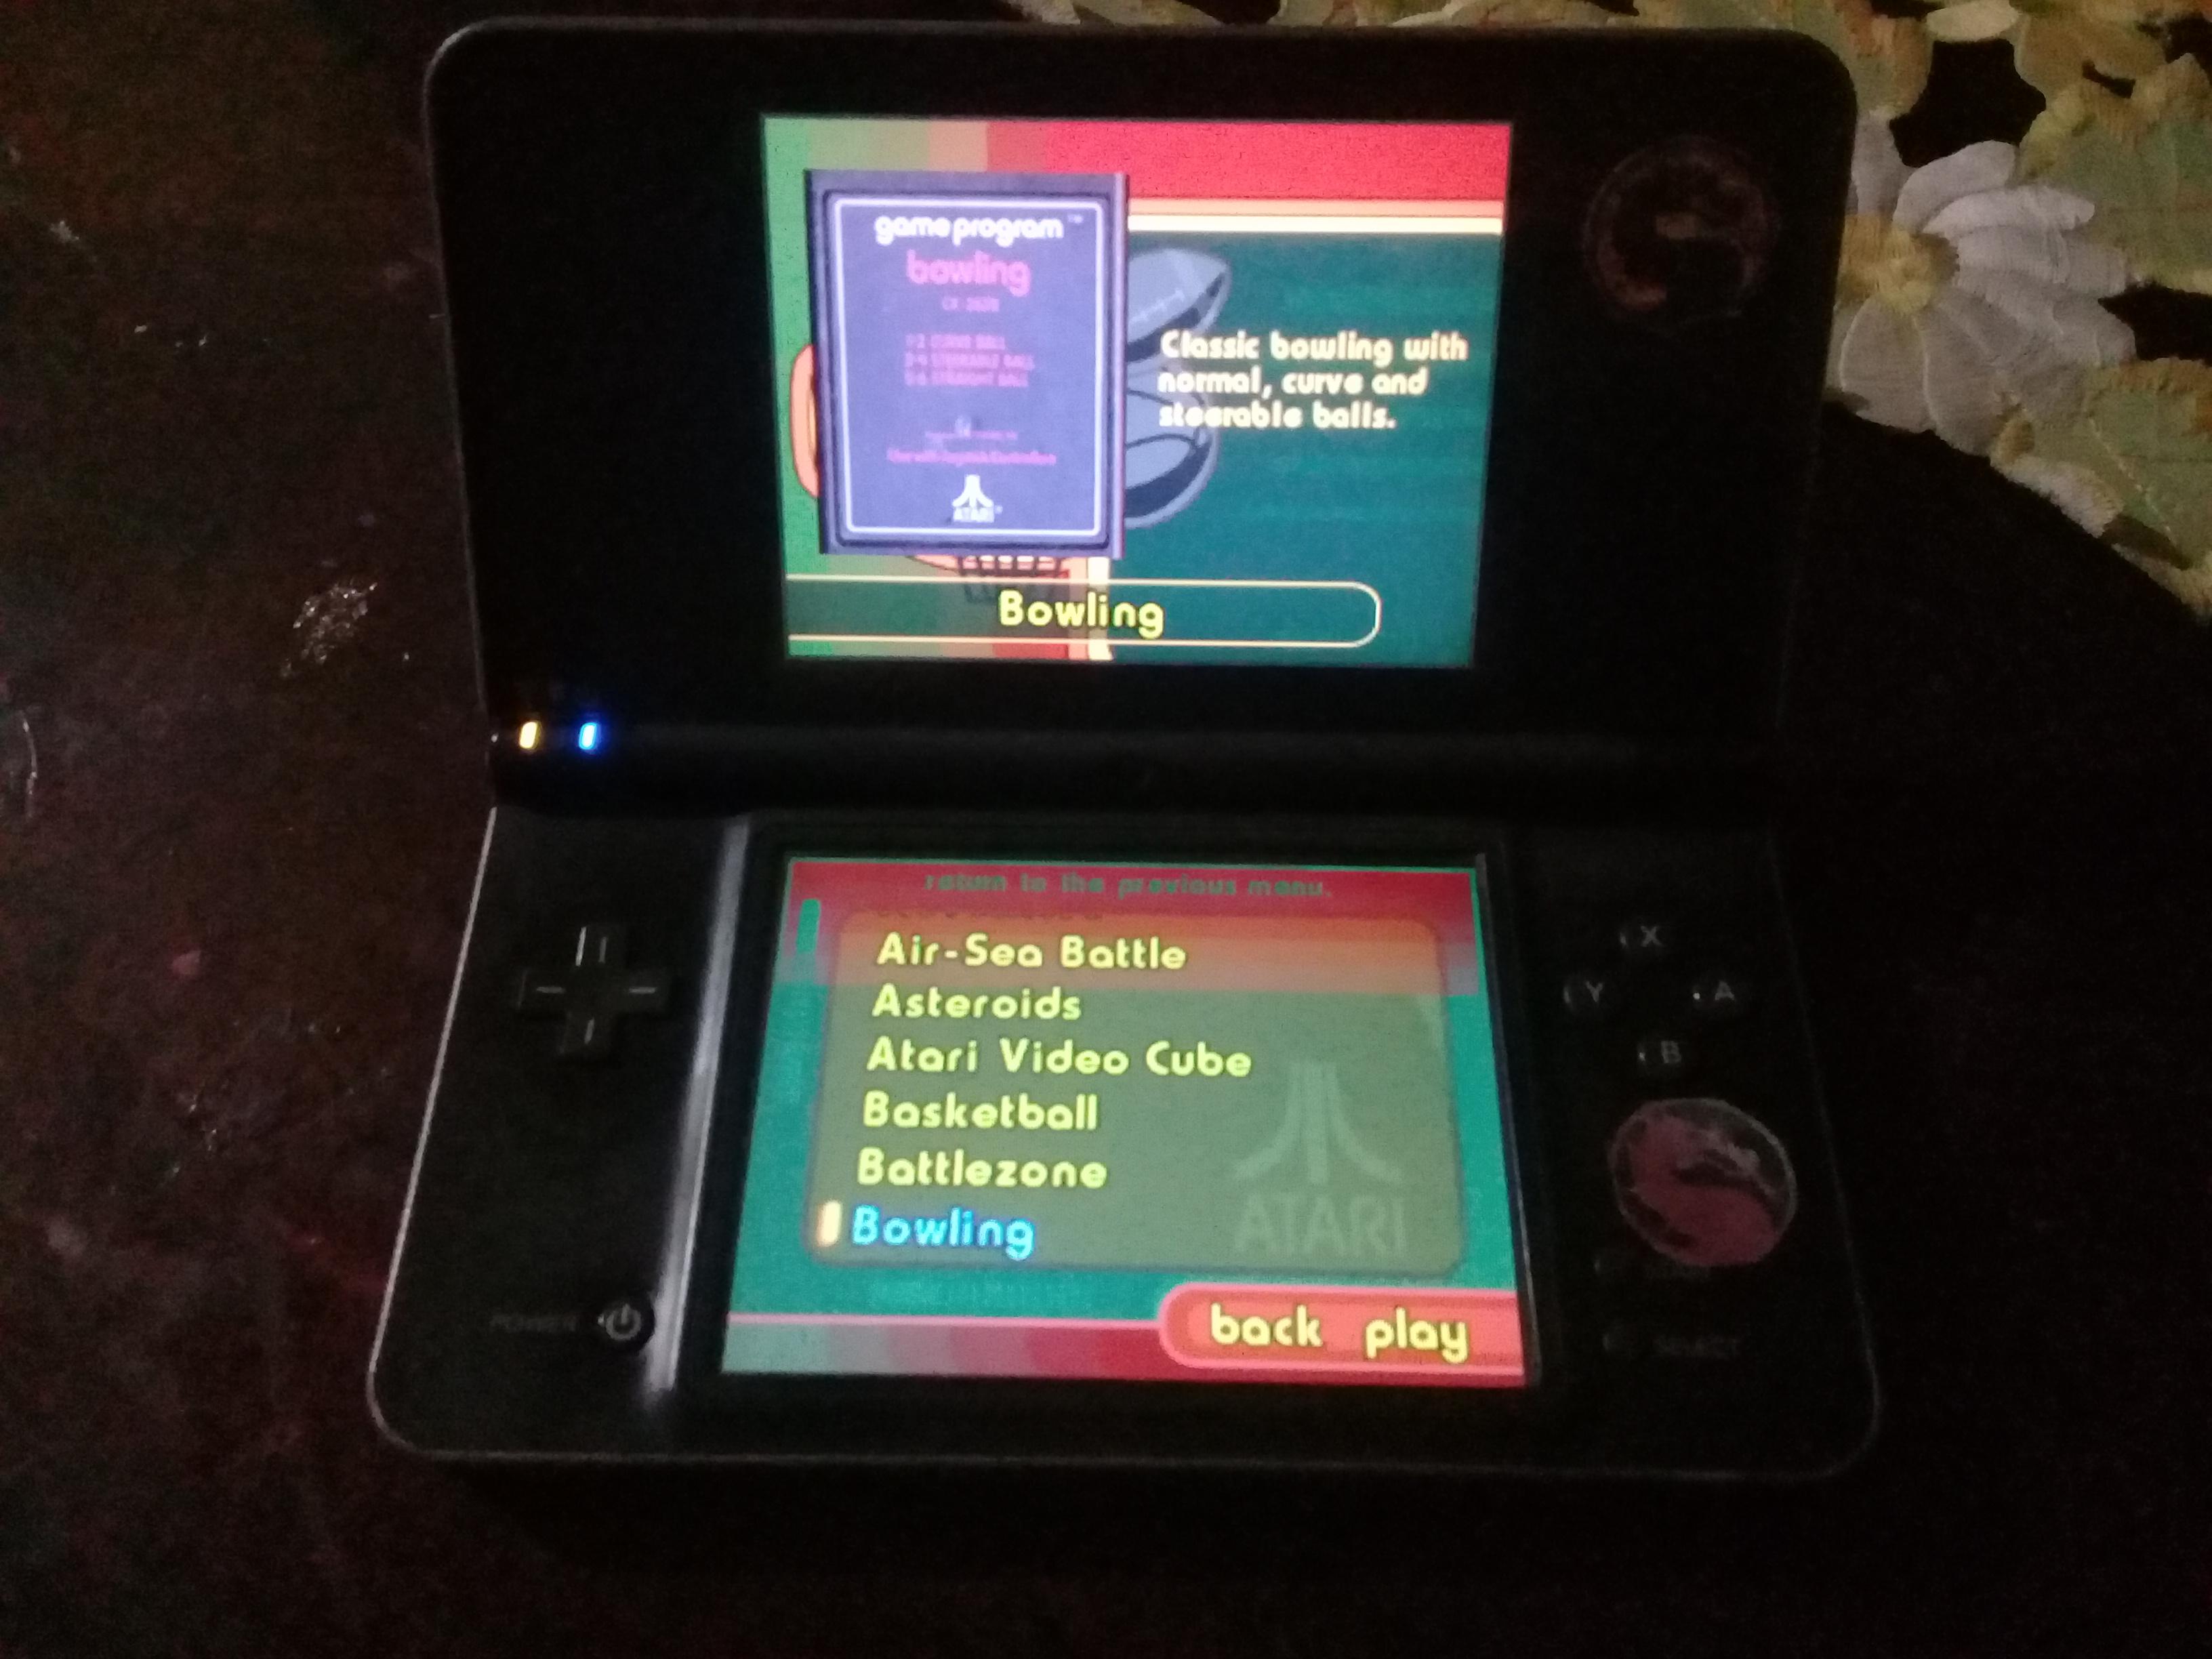 omargeddon: Atari Greatest Hits: Volume 1: Bowling: Game 5 [Atari 2600] (Nintendo DS) 170 points on 2021-10-01 00:29:19